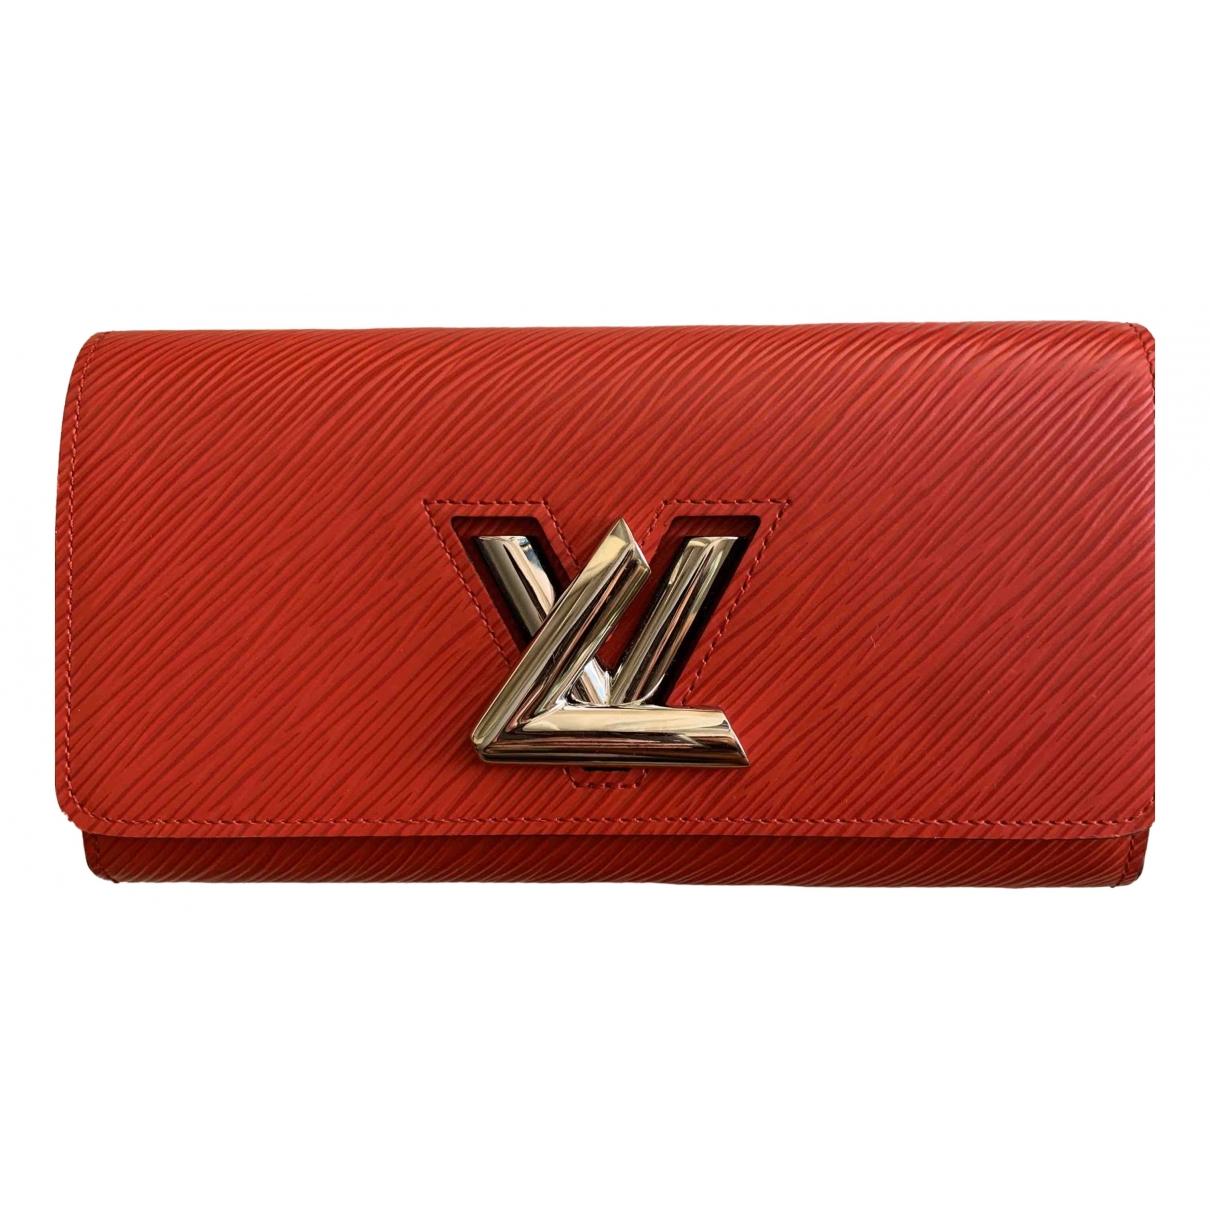 Louis Vuitton Twist Red Leather wallet for Women \N